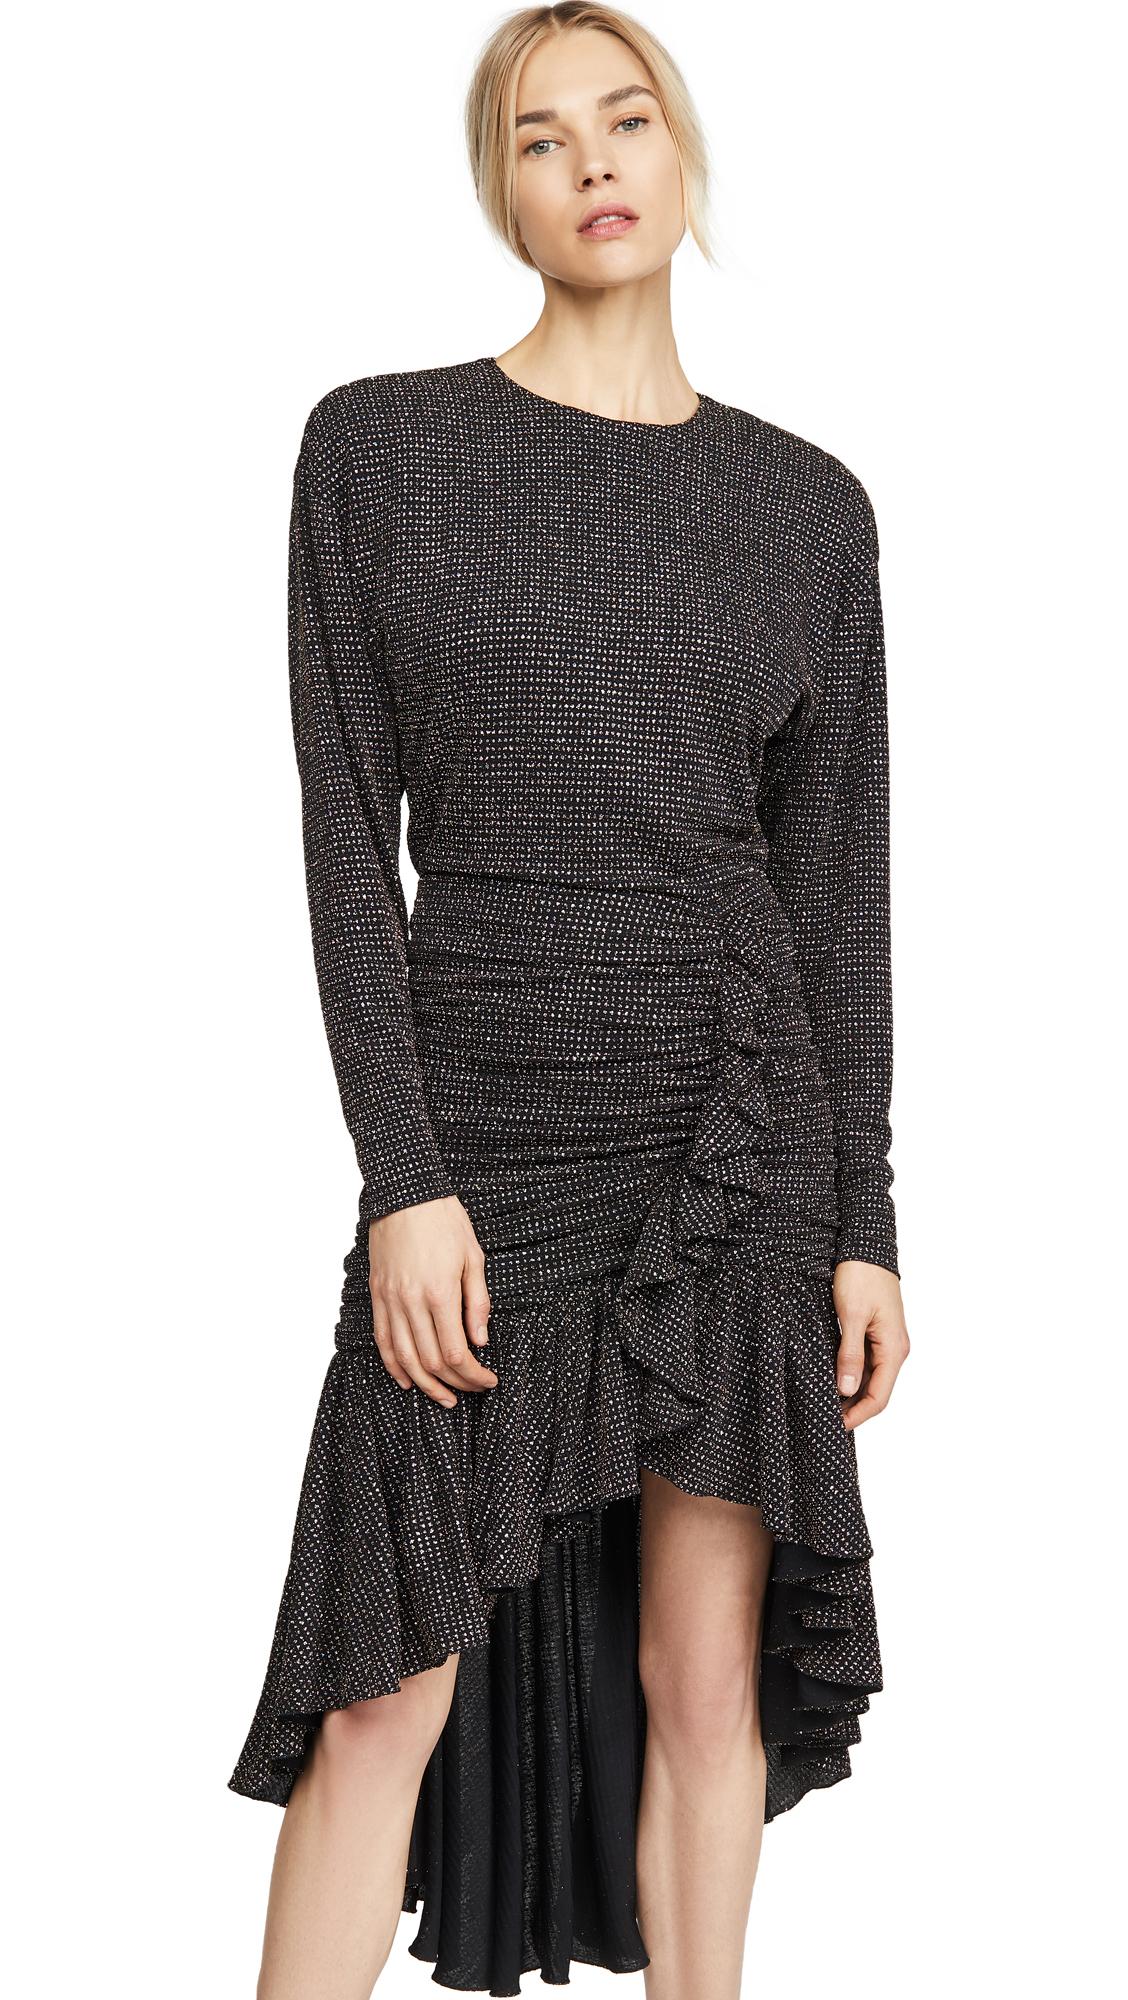 Buy Philosophy di Lorenzo Serafini Long Sleeve Asymmetrical Dress online beautiful Philosophy di Lorenzo Serafini Clothing, Dresses